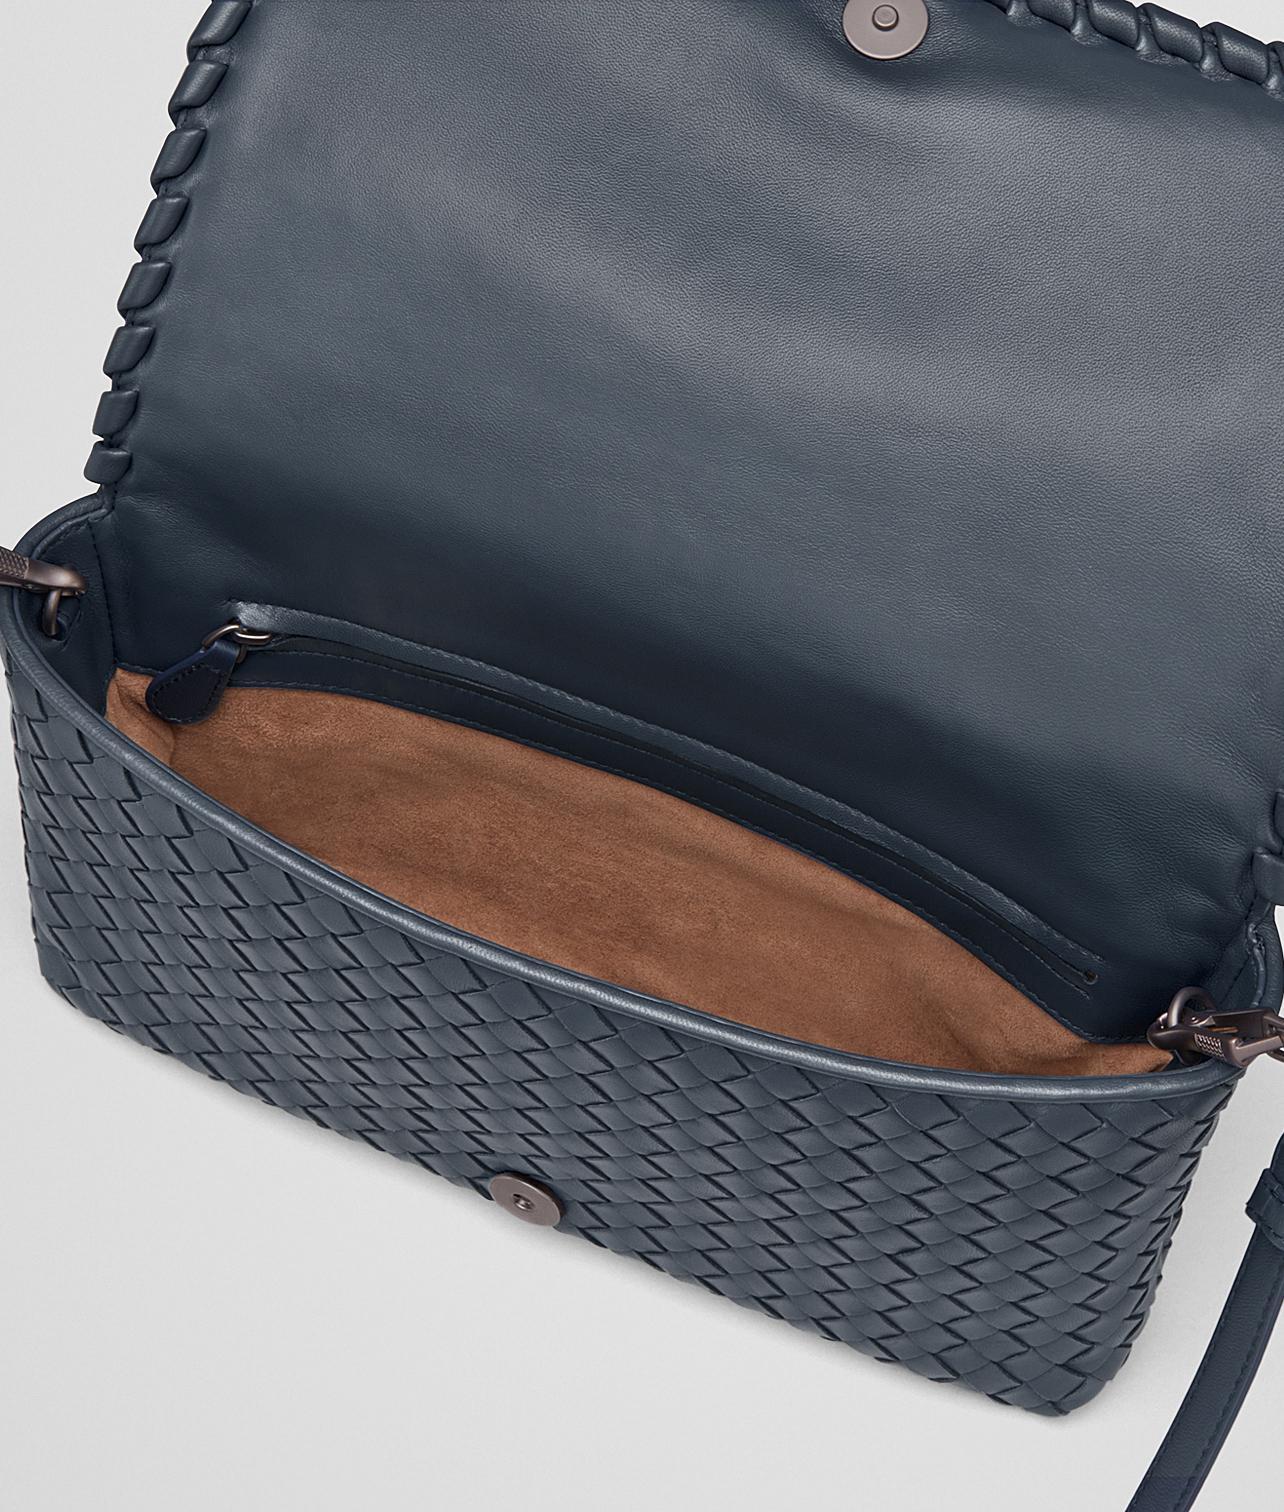 8c04f8c9d82 Bottega Veneta Medium Clutch Bag in Blue - Lyst